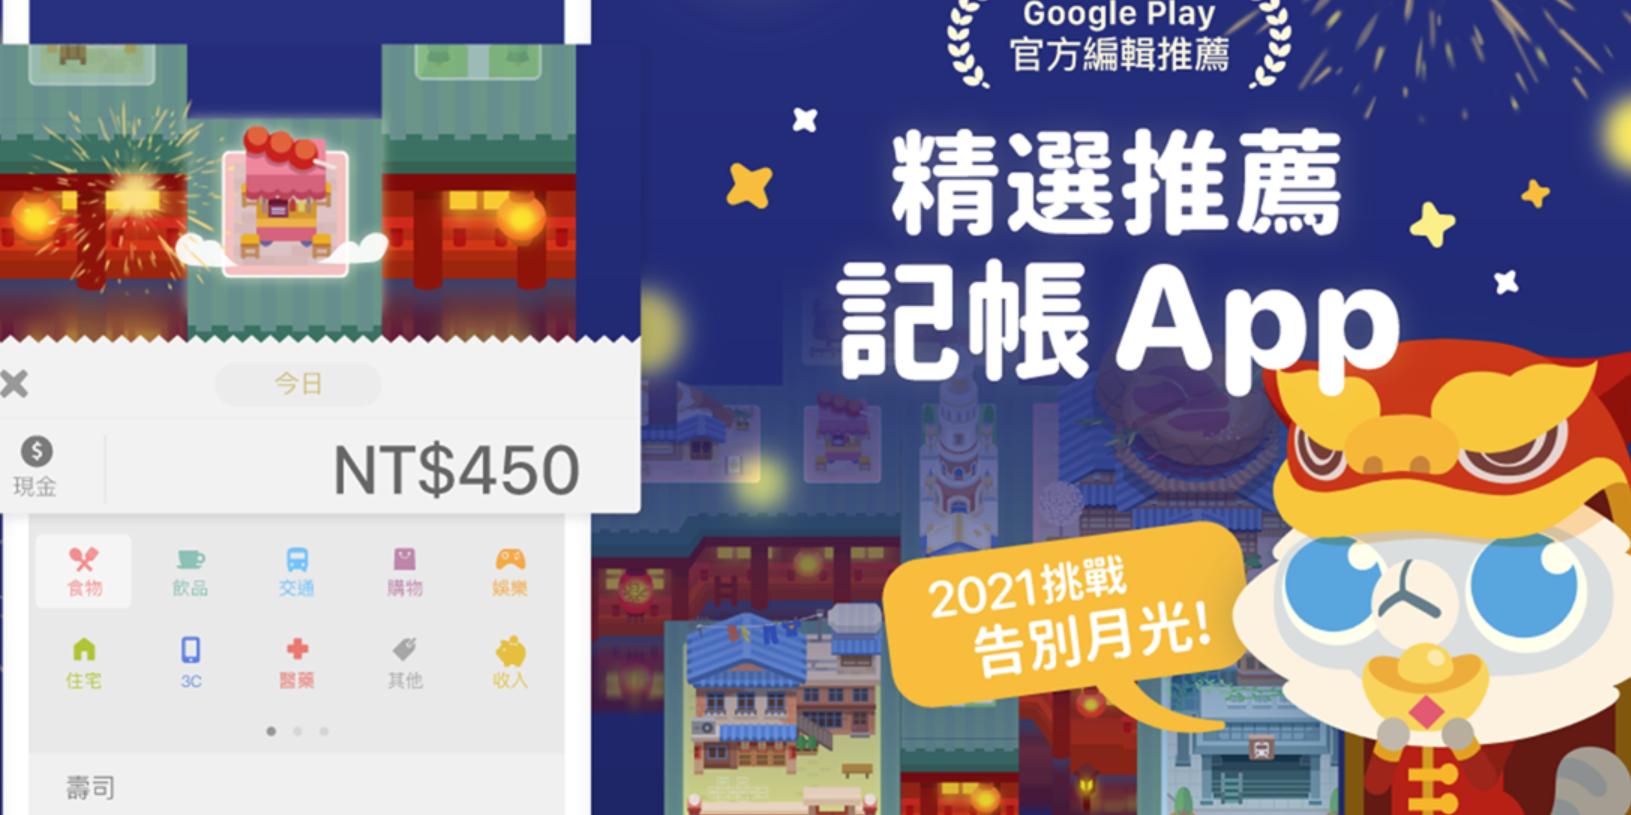 2021 Google Play 新春精選推薦《記帳城市》App 和你一起聰明儲蓄 @3C 達人廖阿輝